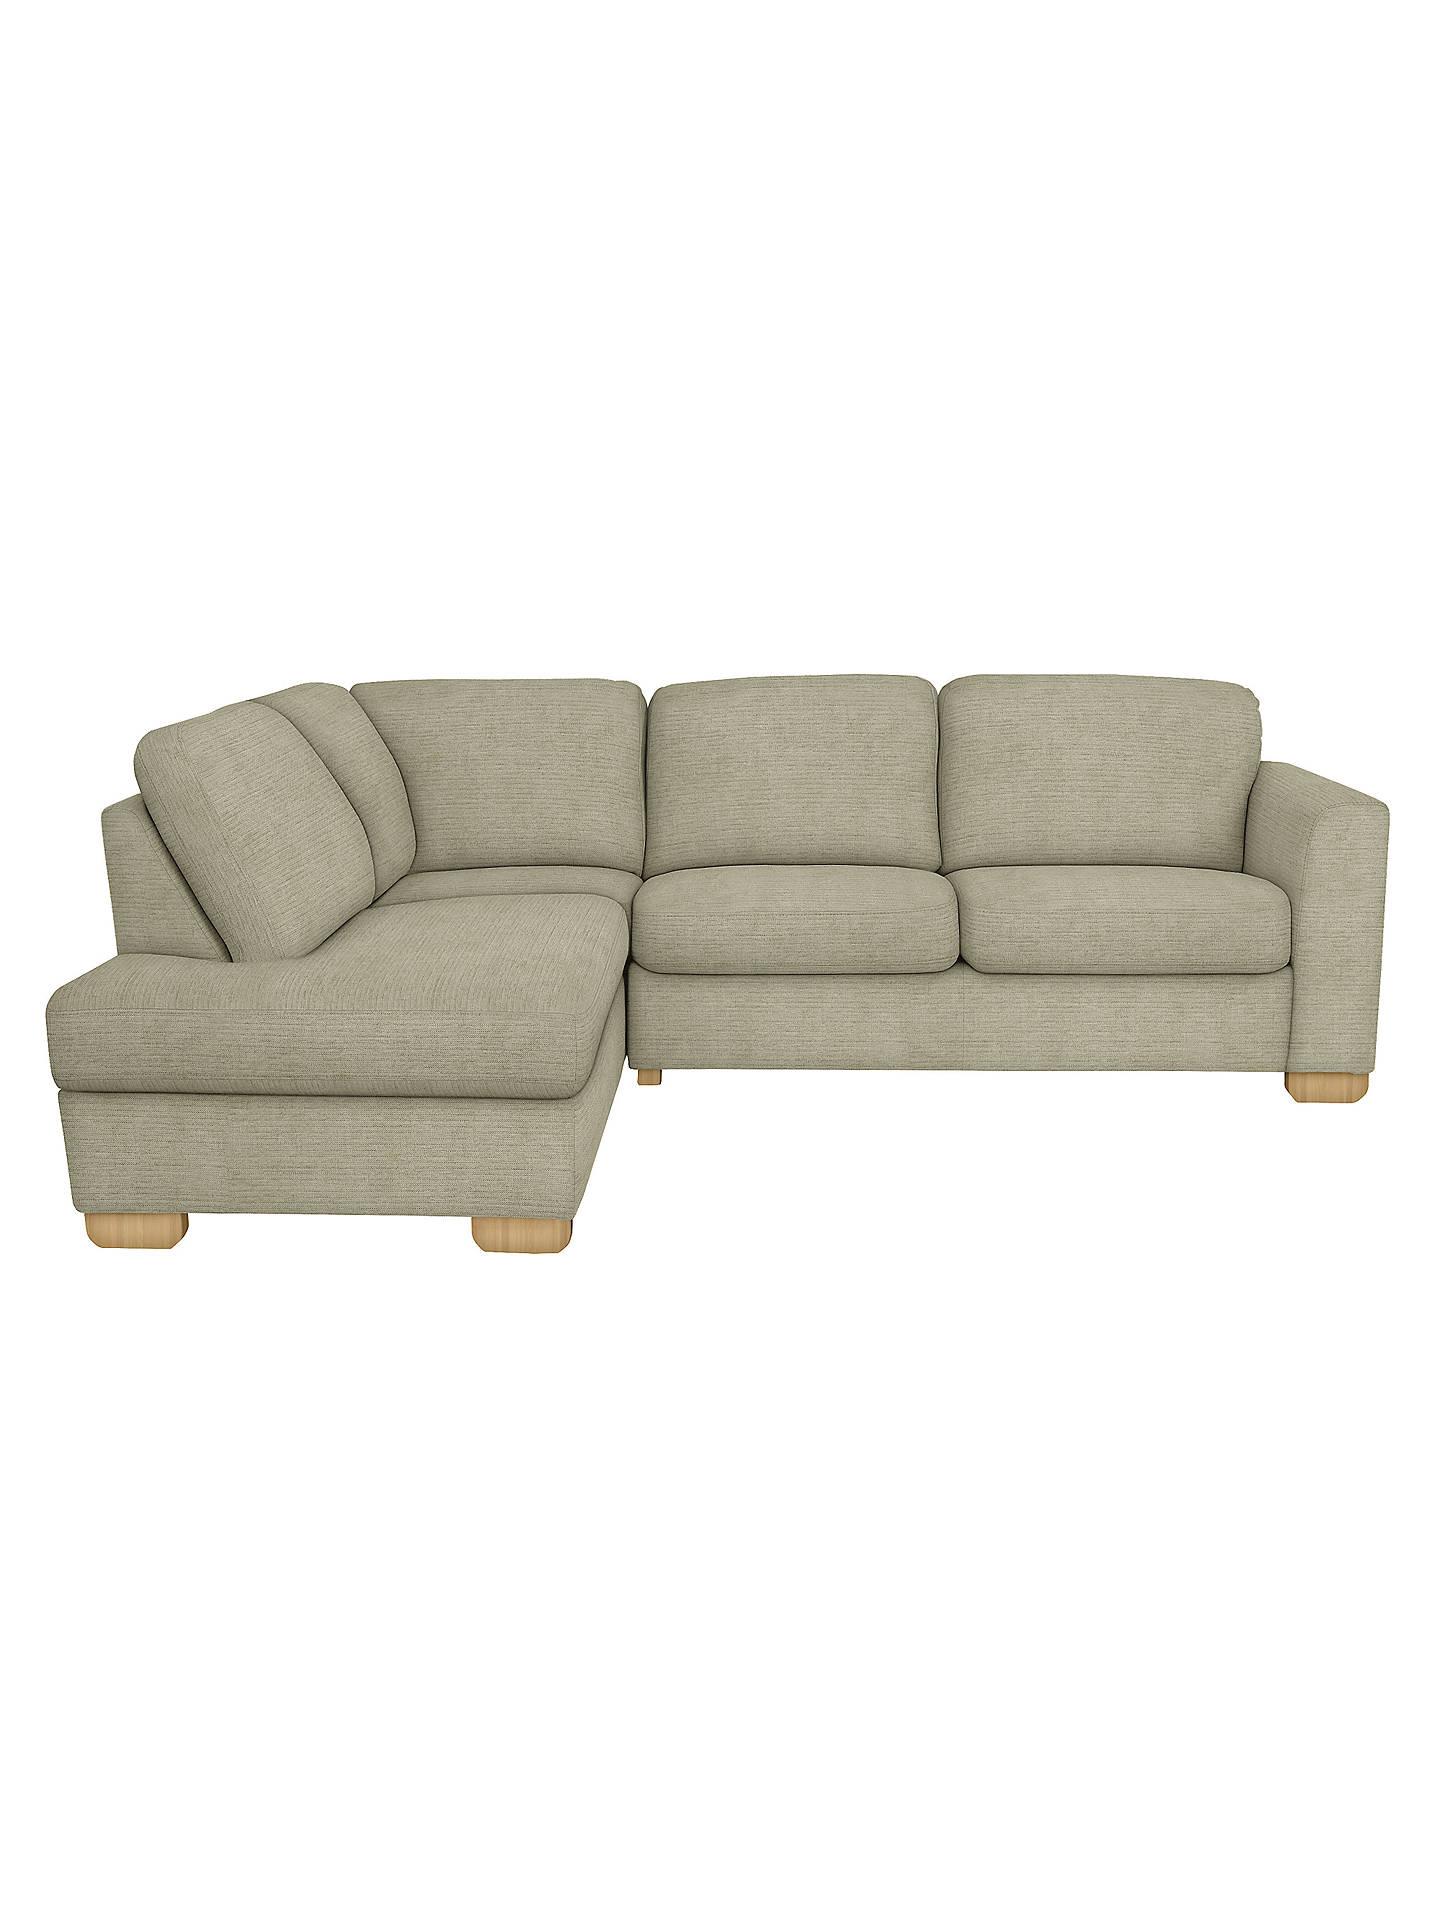 John Lewis Cooper LHF Corner Chaise Sofa, Light Leg, Elena Mocha at ...